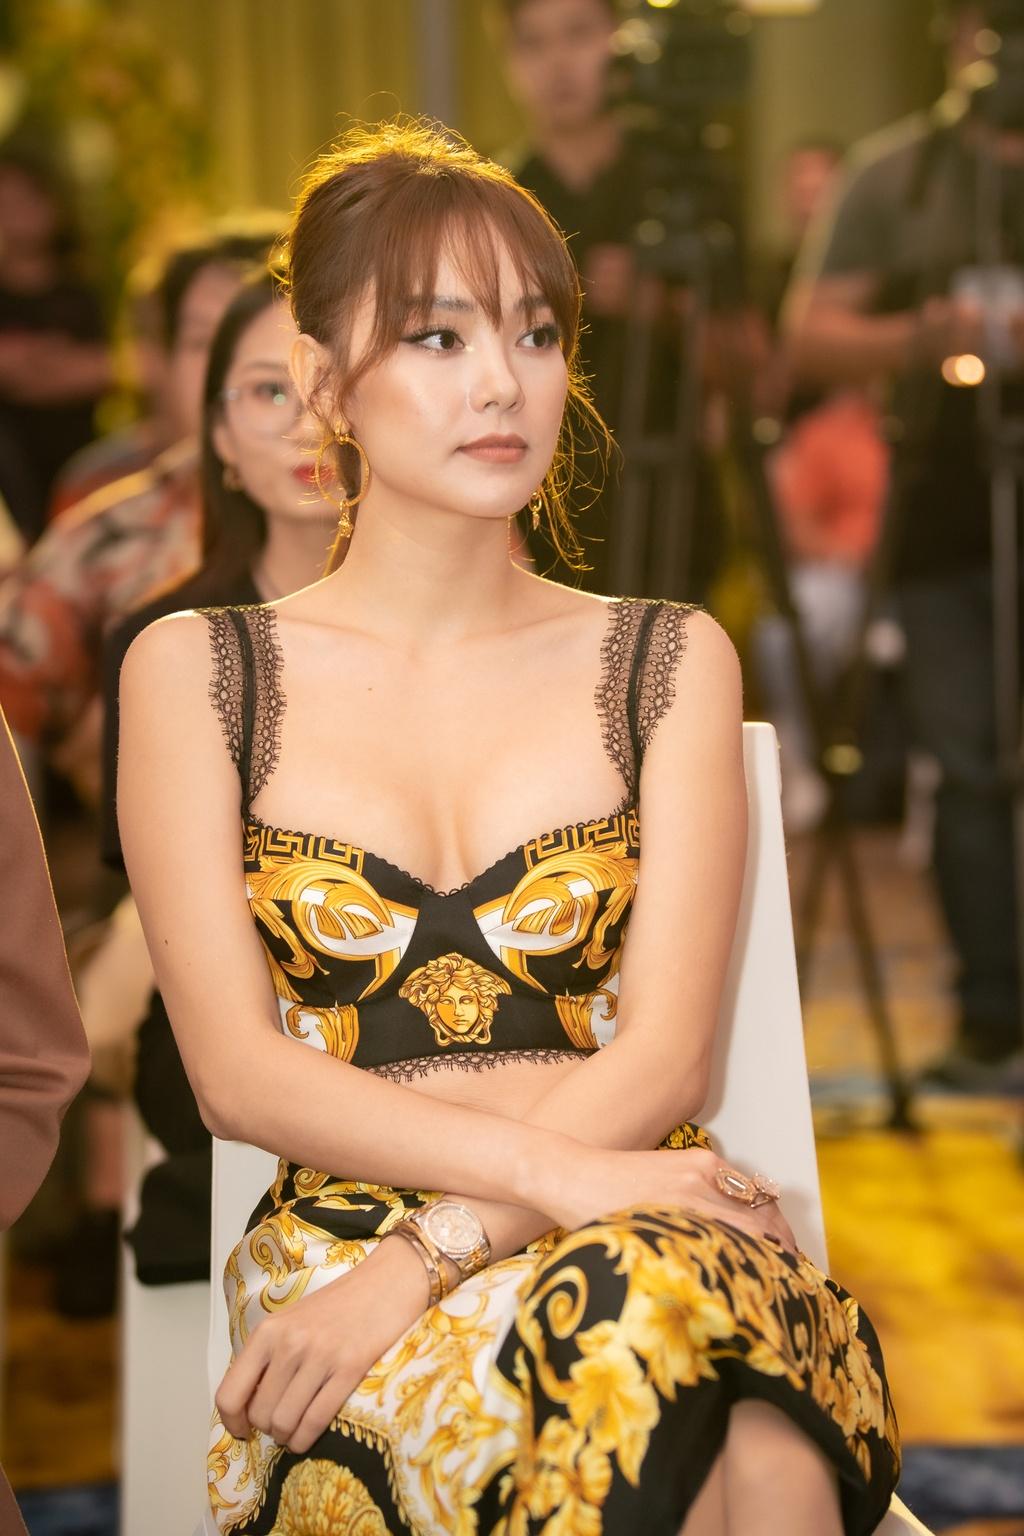 Quoc Truong om hon Bao Anh tren san khau hinh anh 9 NQP4311.jpg